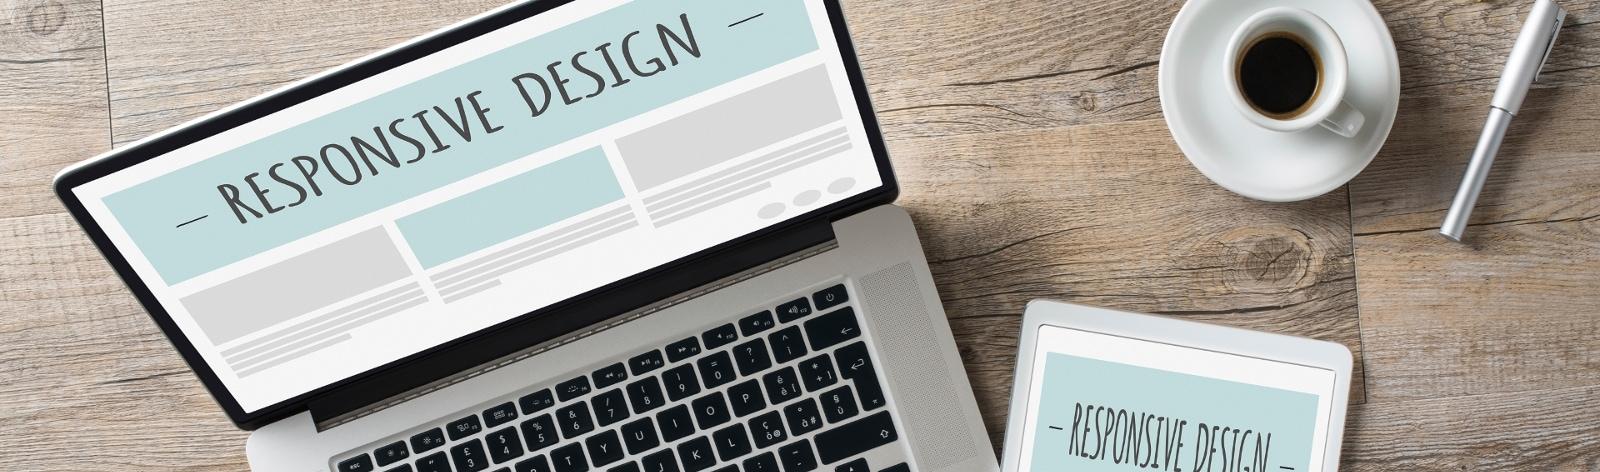 wordpress-responsive-websites-webdesign-online-marketing